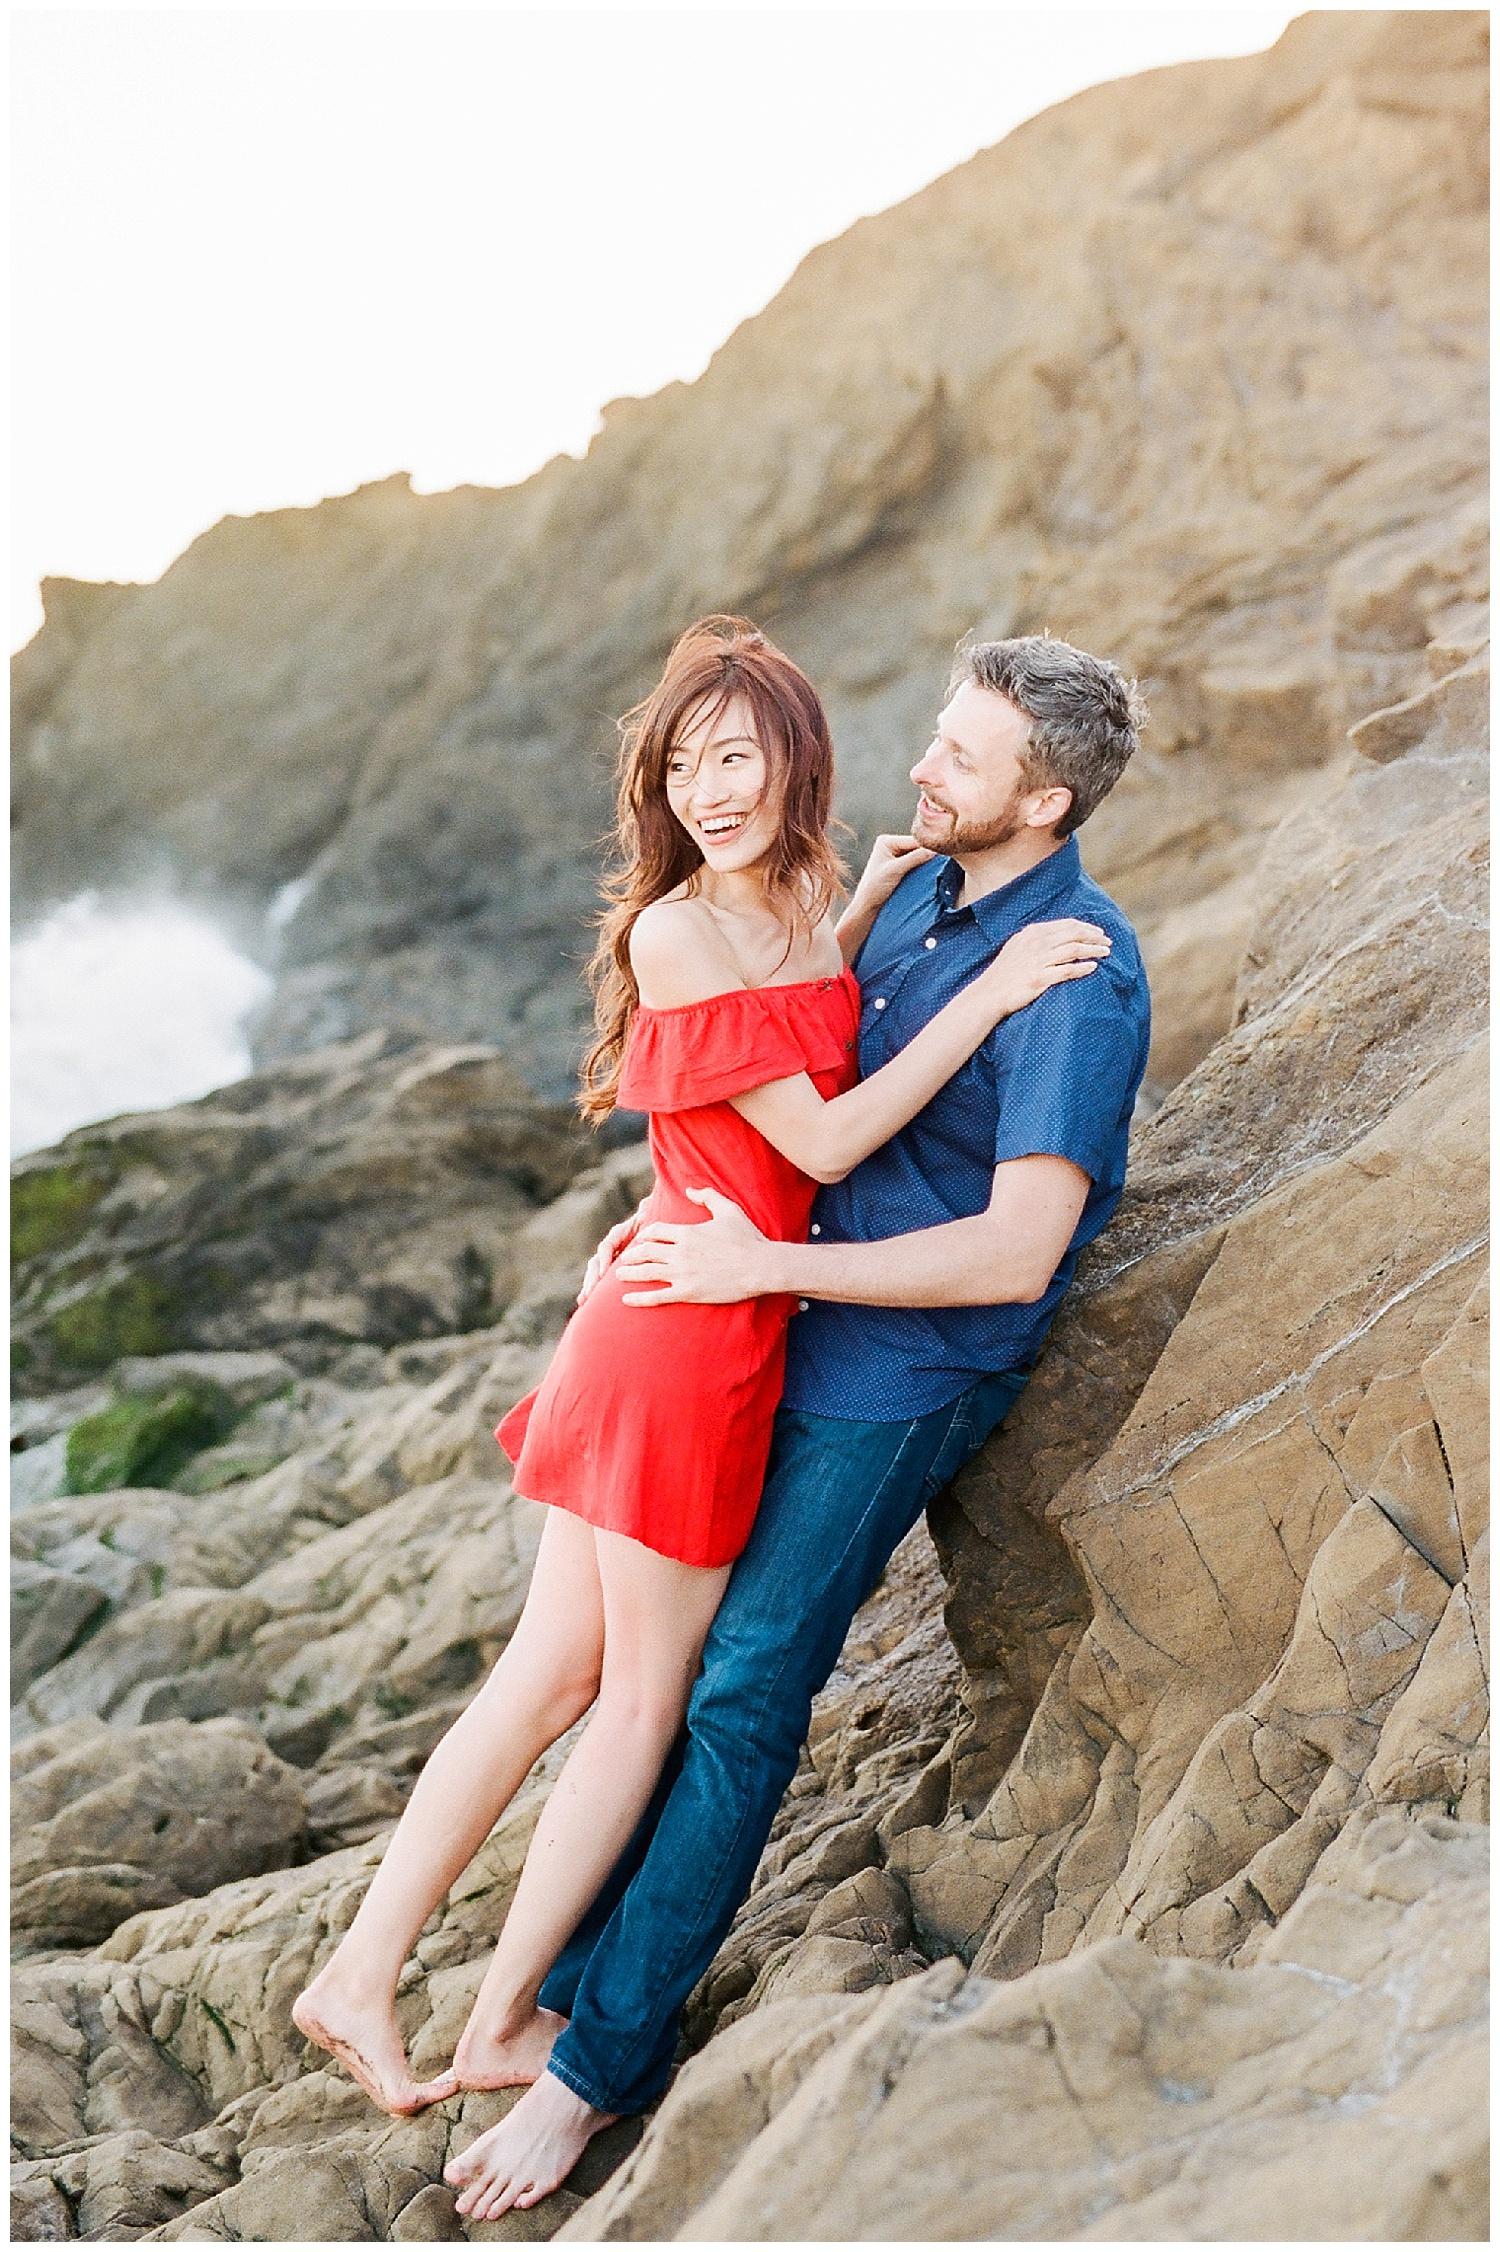 Janine_Licare_Photography_San_Francisco_Wedding_Photographer_0010.jpg